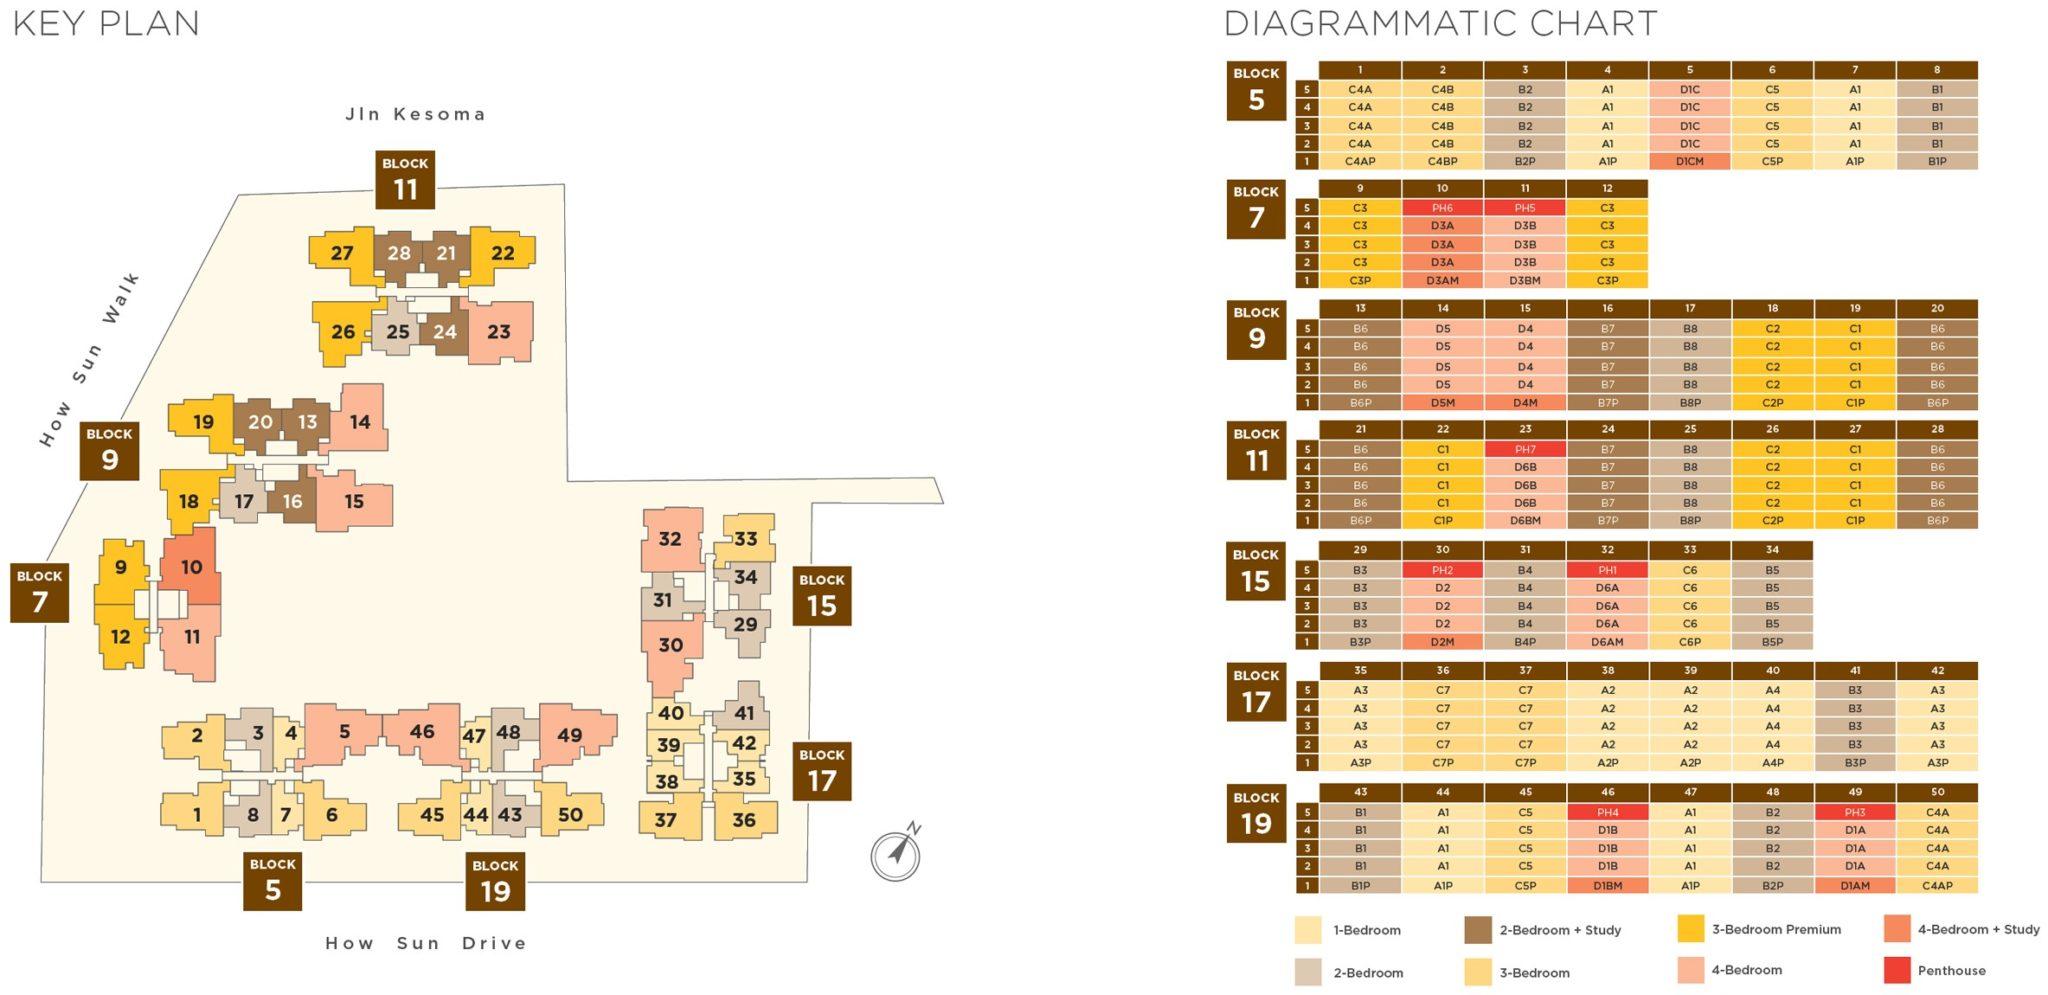 The_Gazania-Diagrammatic-chart